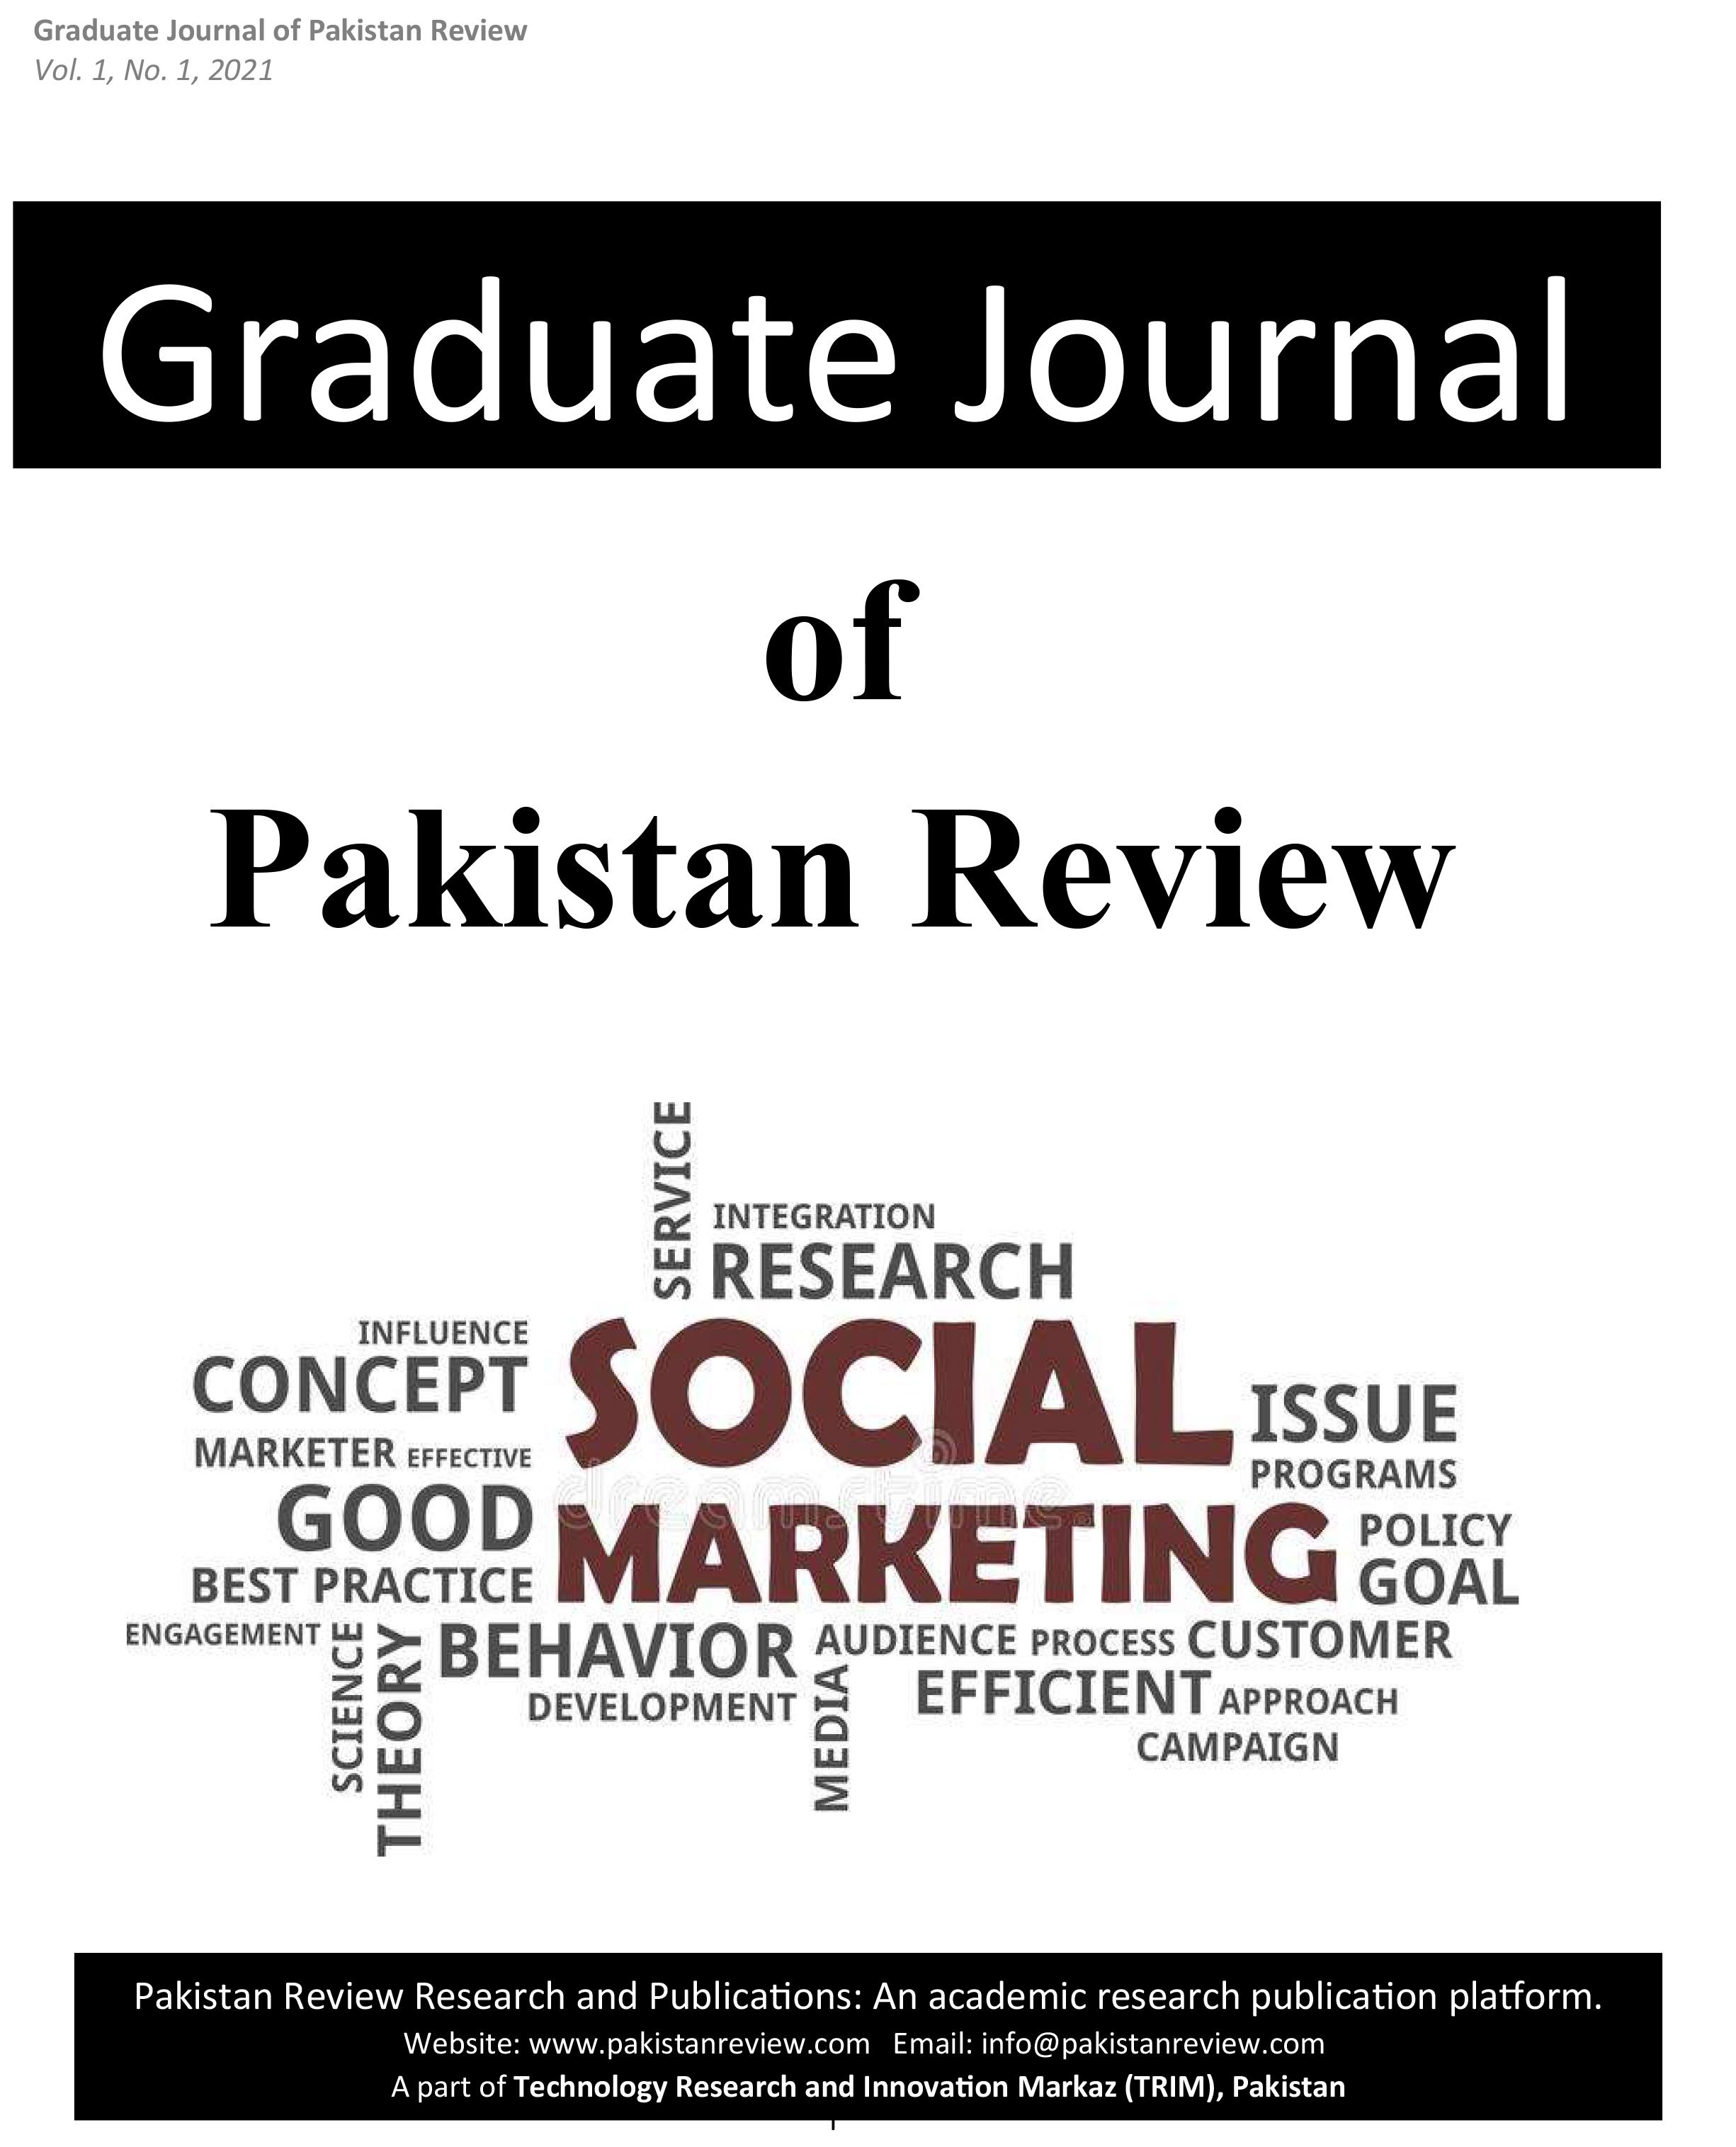 View Vol. 1 No. 1 (2021): Graduate Journal of Pakistan Review